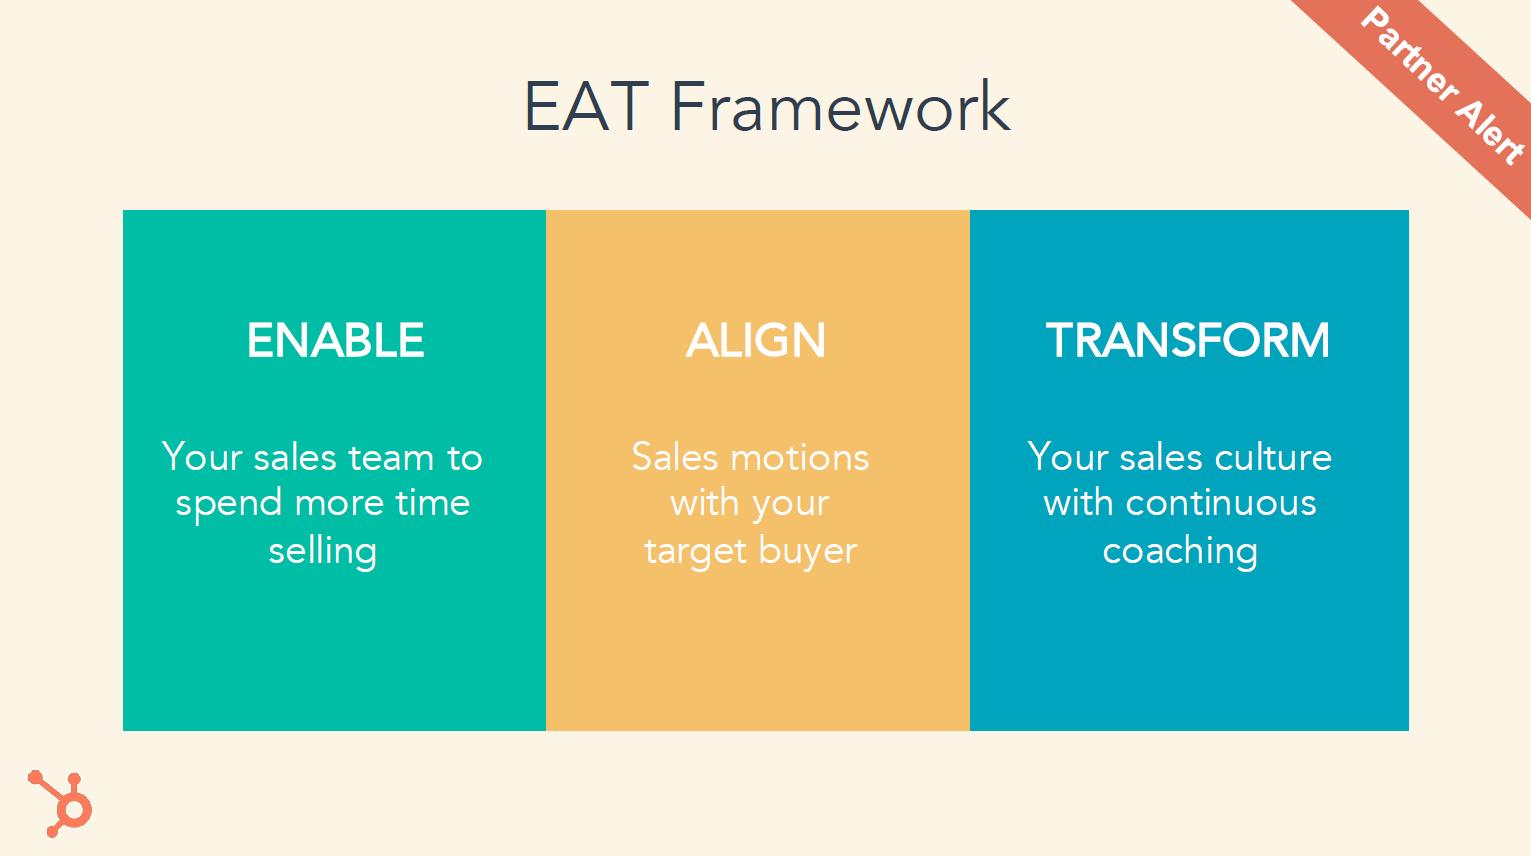 EAT Framework